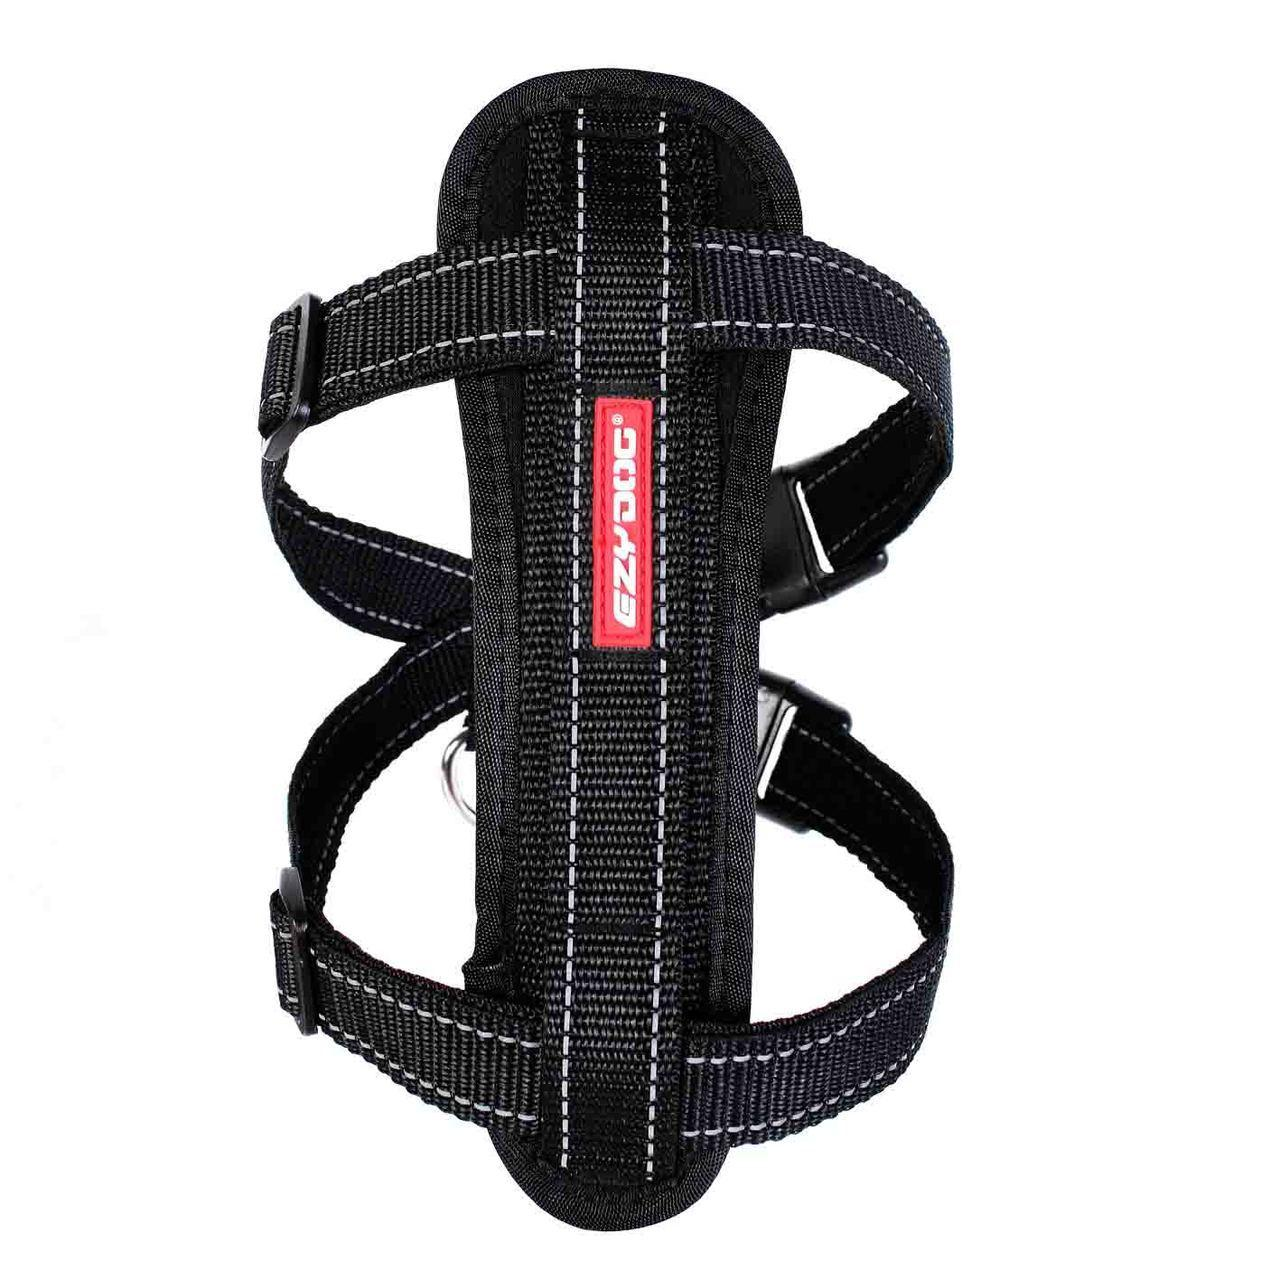 EzyDog Chest Plate Dog Harness - Black